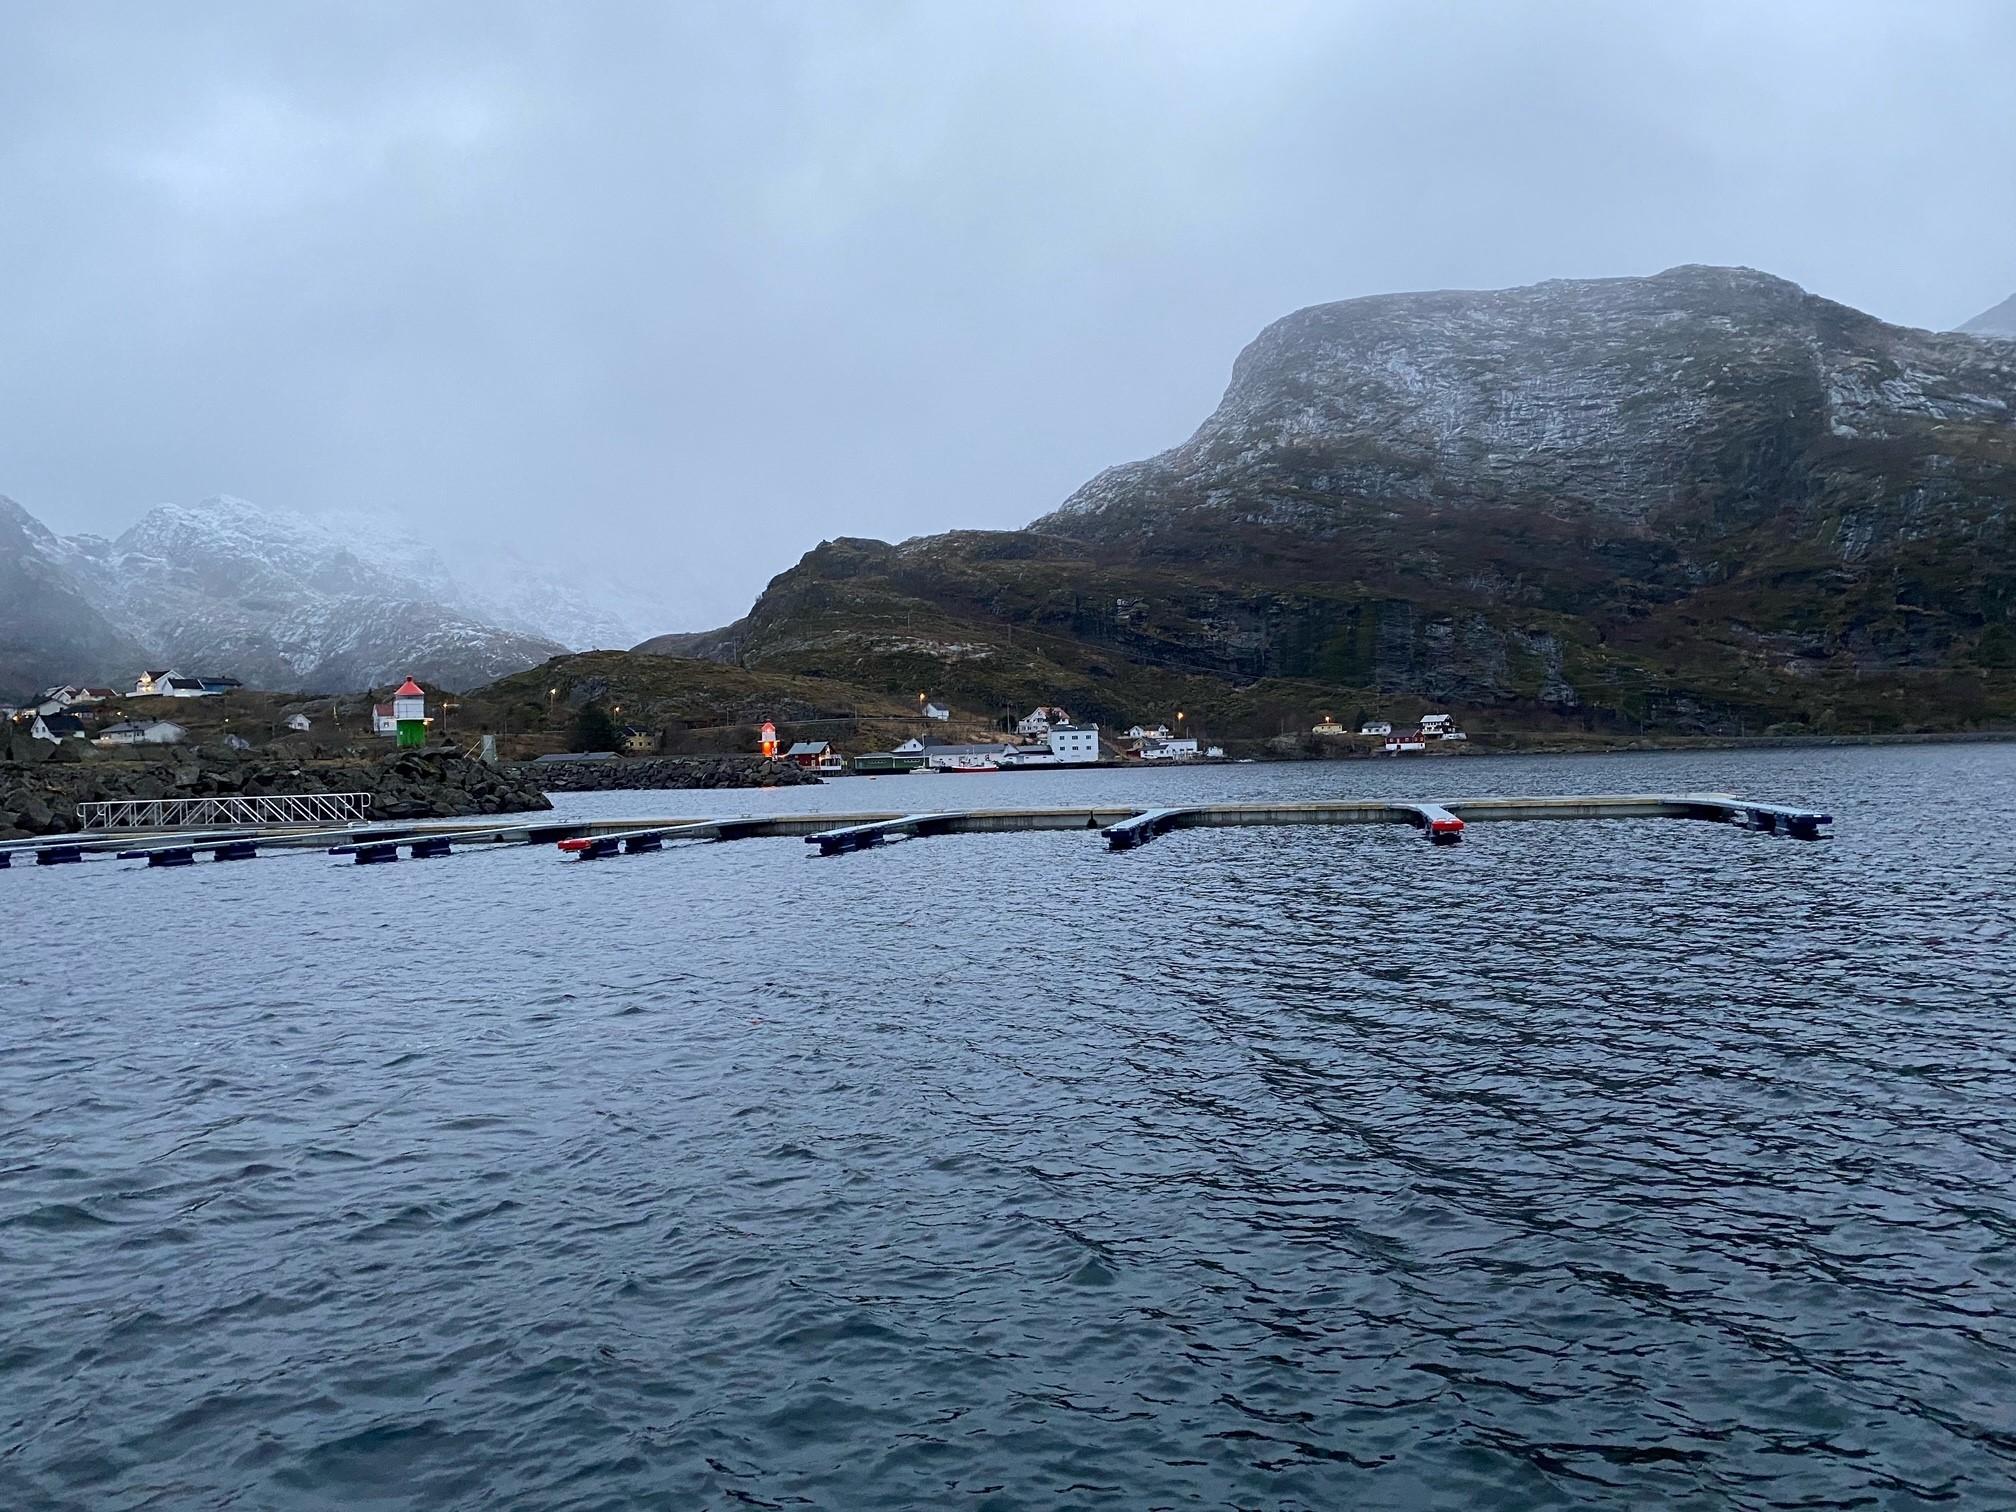 https://marinasolutions.no/uploads/Moskenesvågen-Fiskebåtlag_betongbrygger-og-utriggere-13.jpg